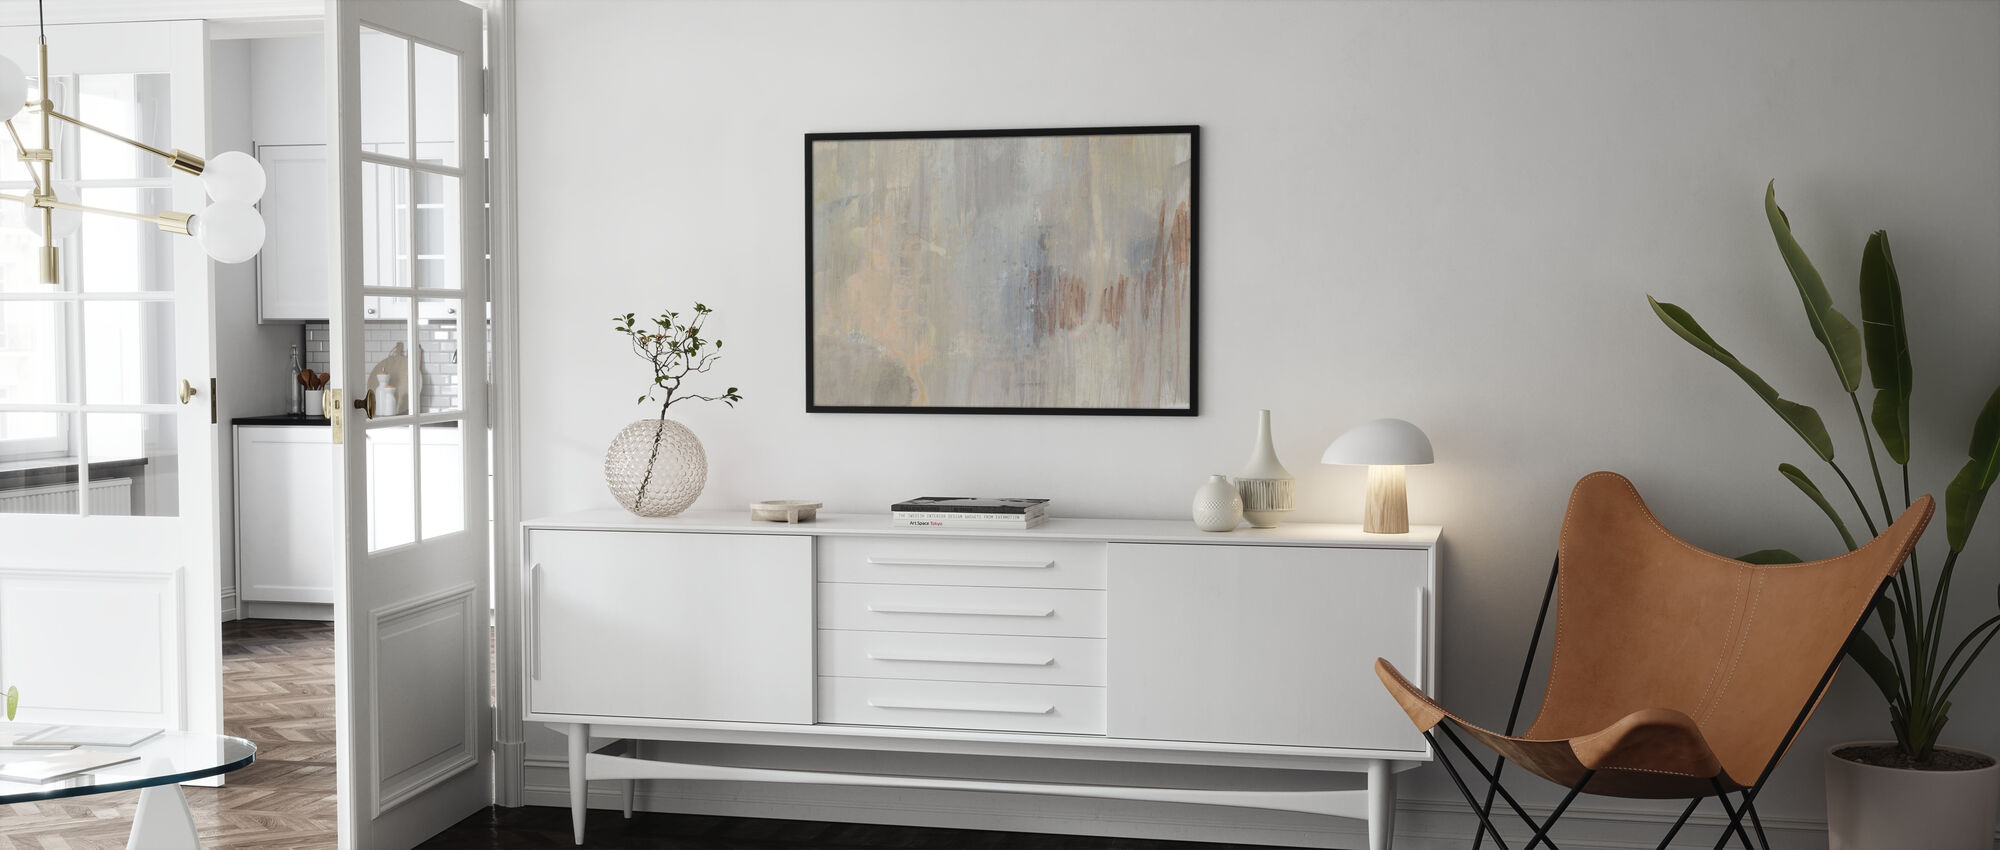 Barely Blush II - Poster - Living Room